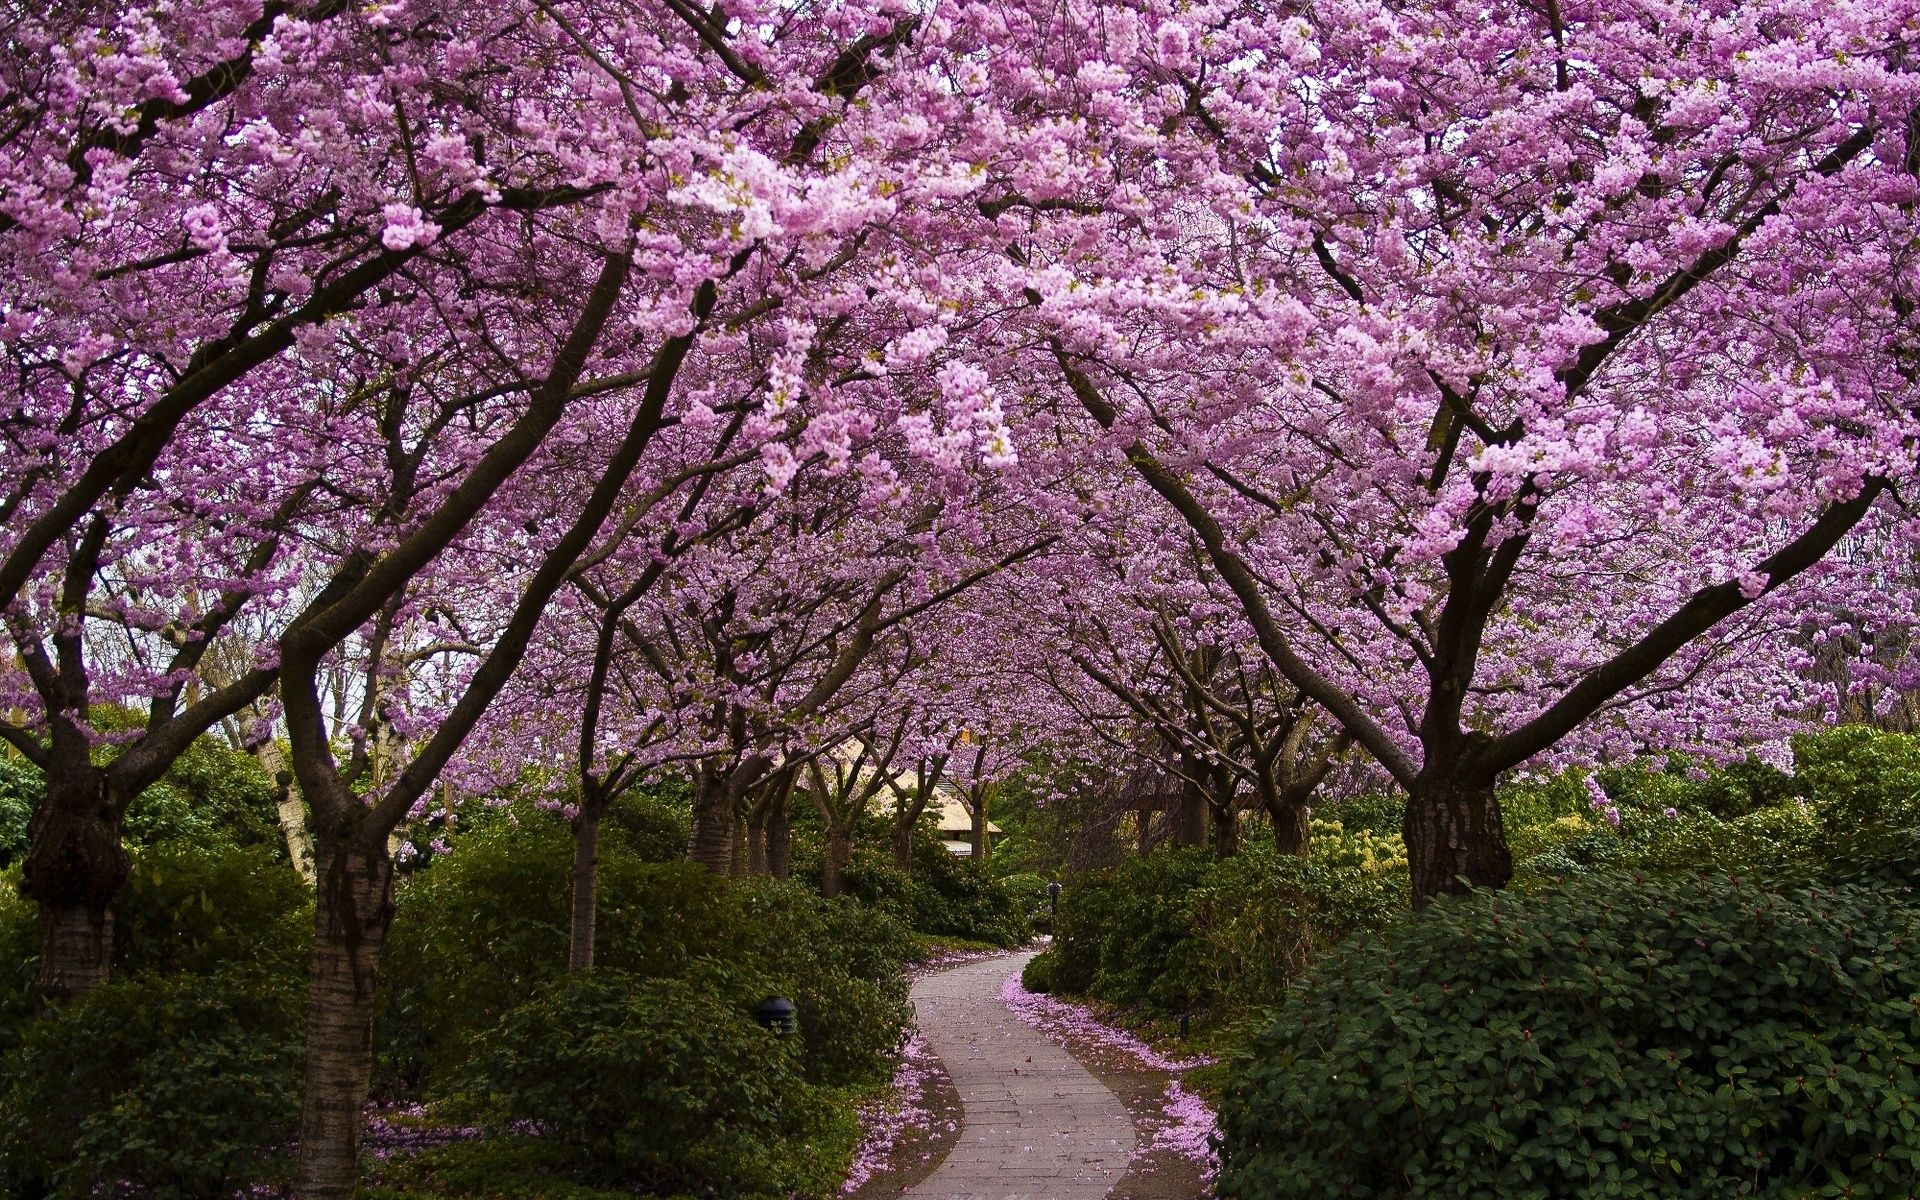 Japanese Cherry Blossom Garden Wallpaper Hd